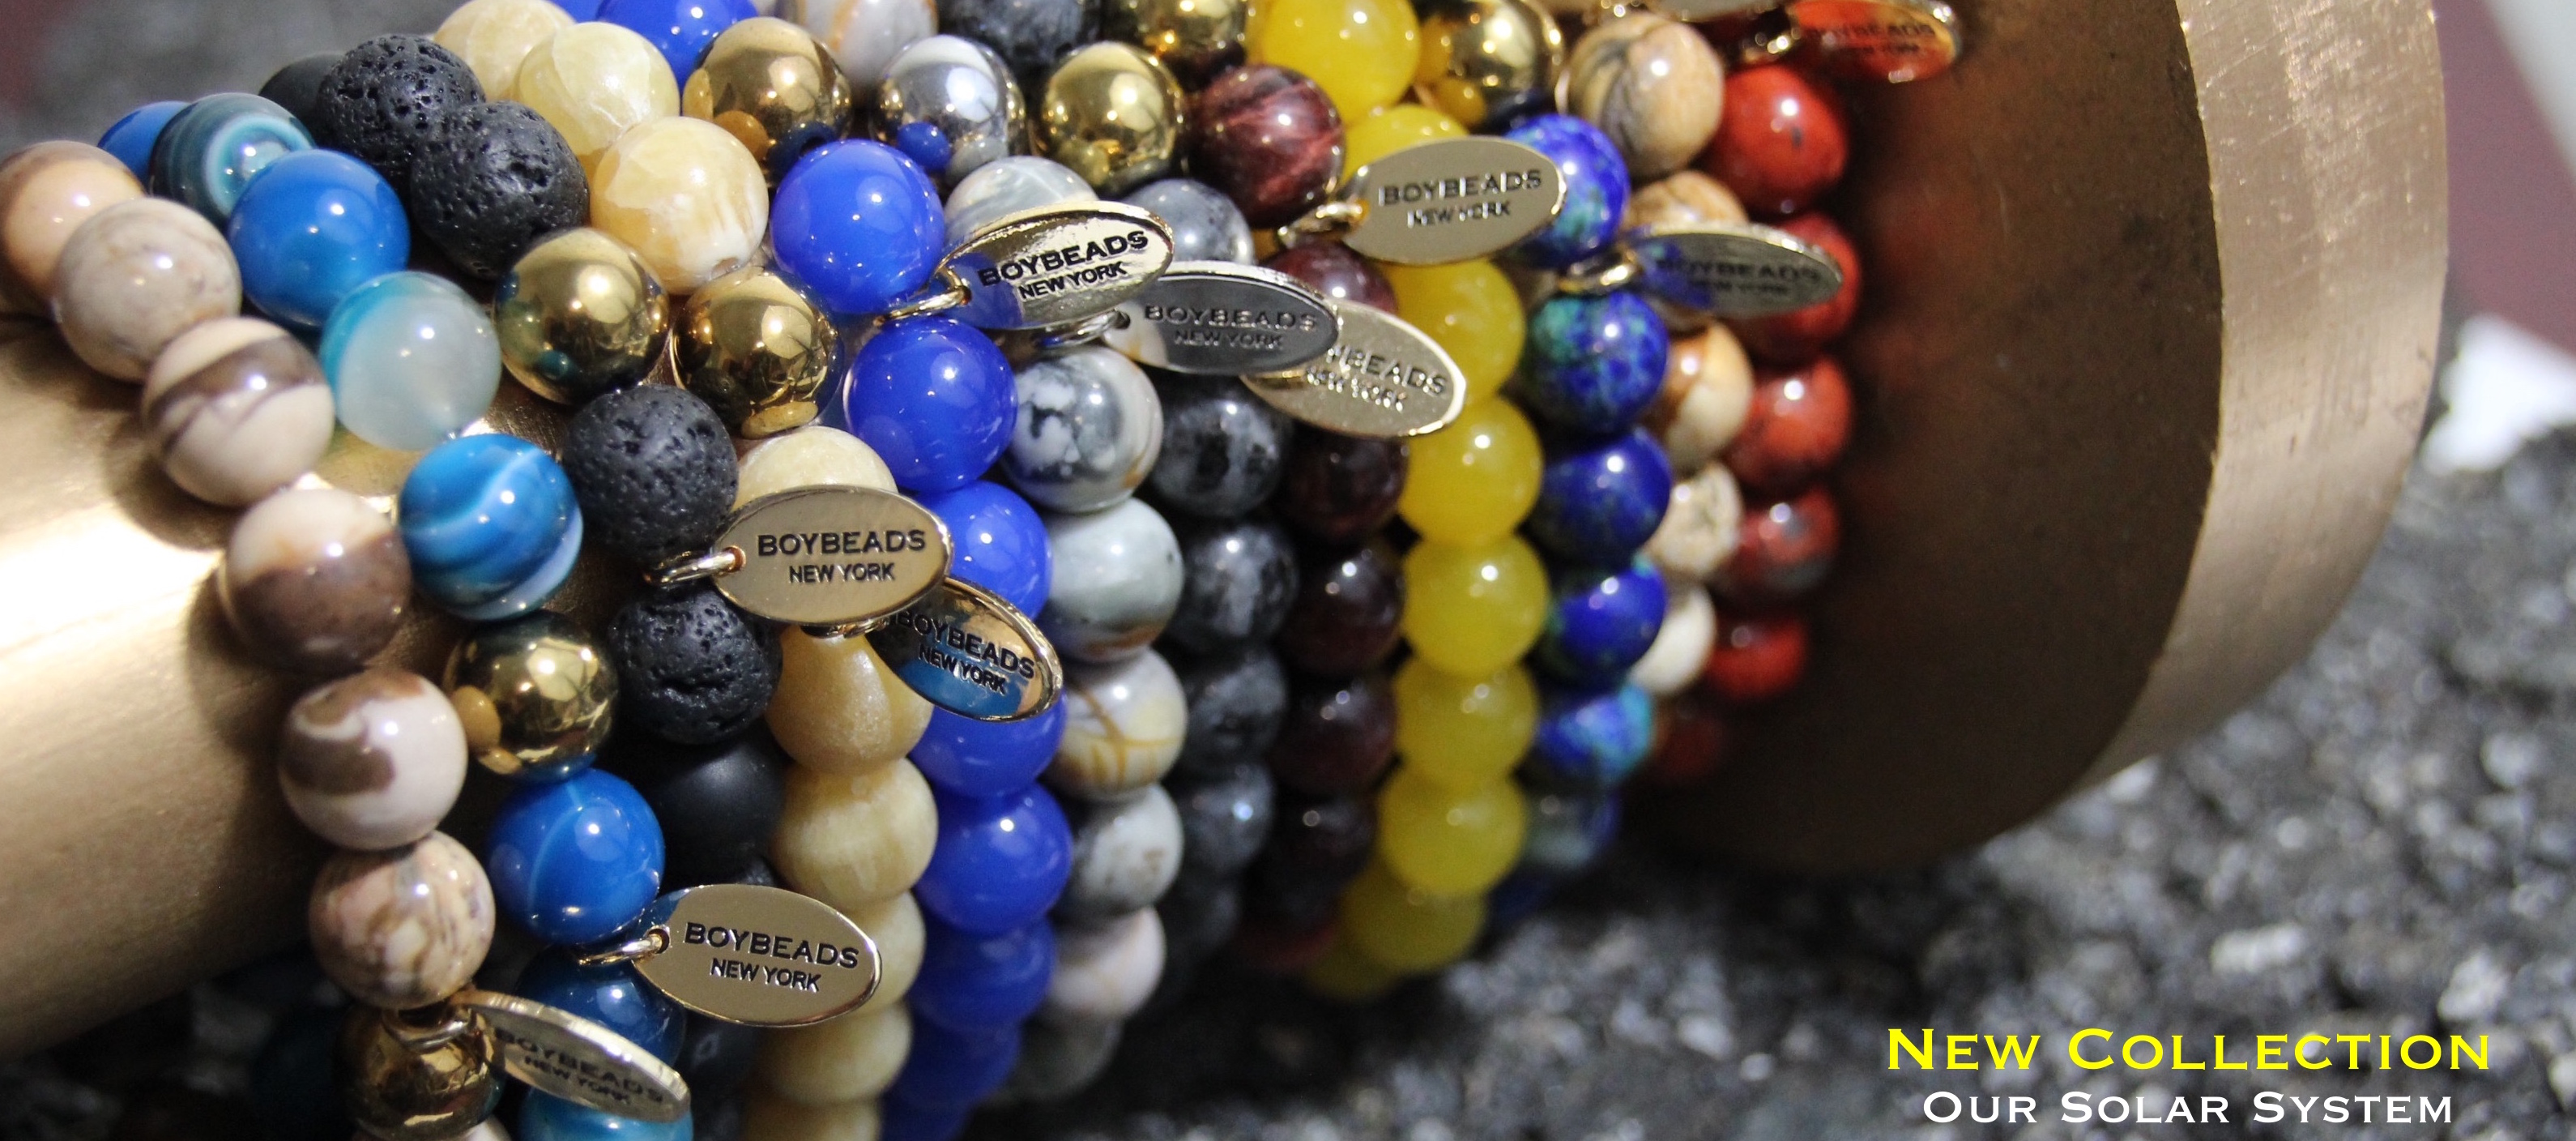 Boybeads Custom Natural Stone Bead Bracelets Necklaces